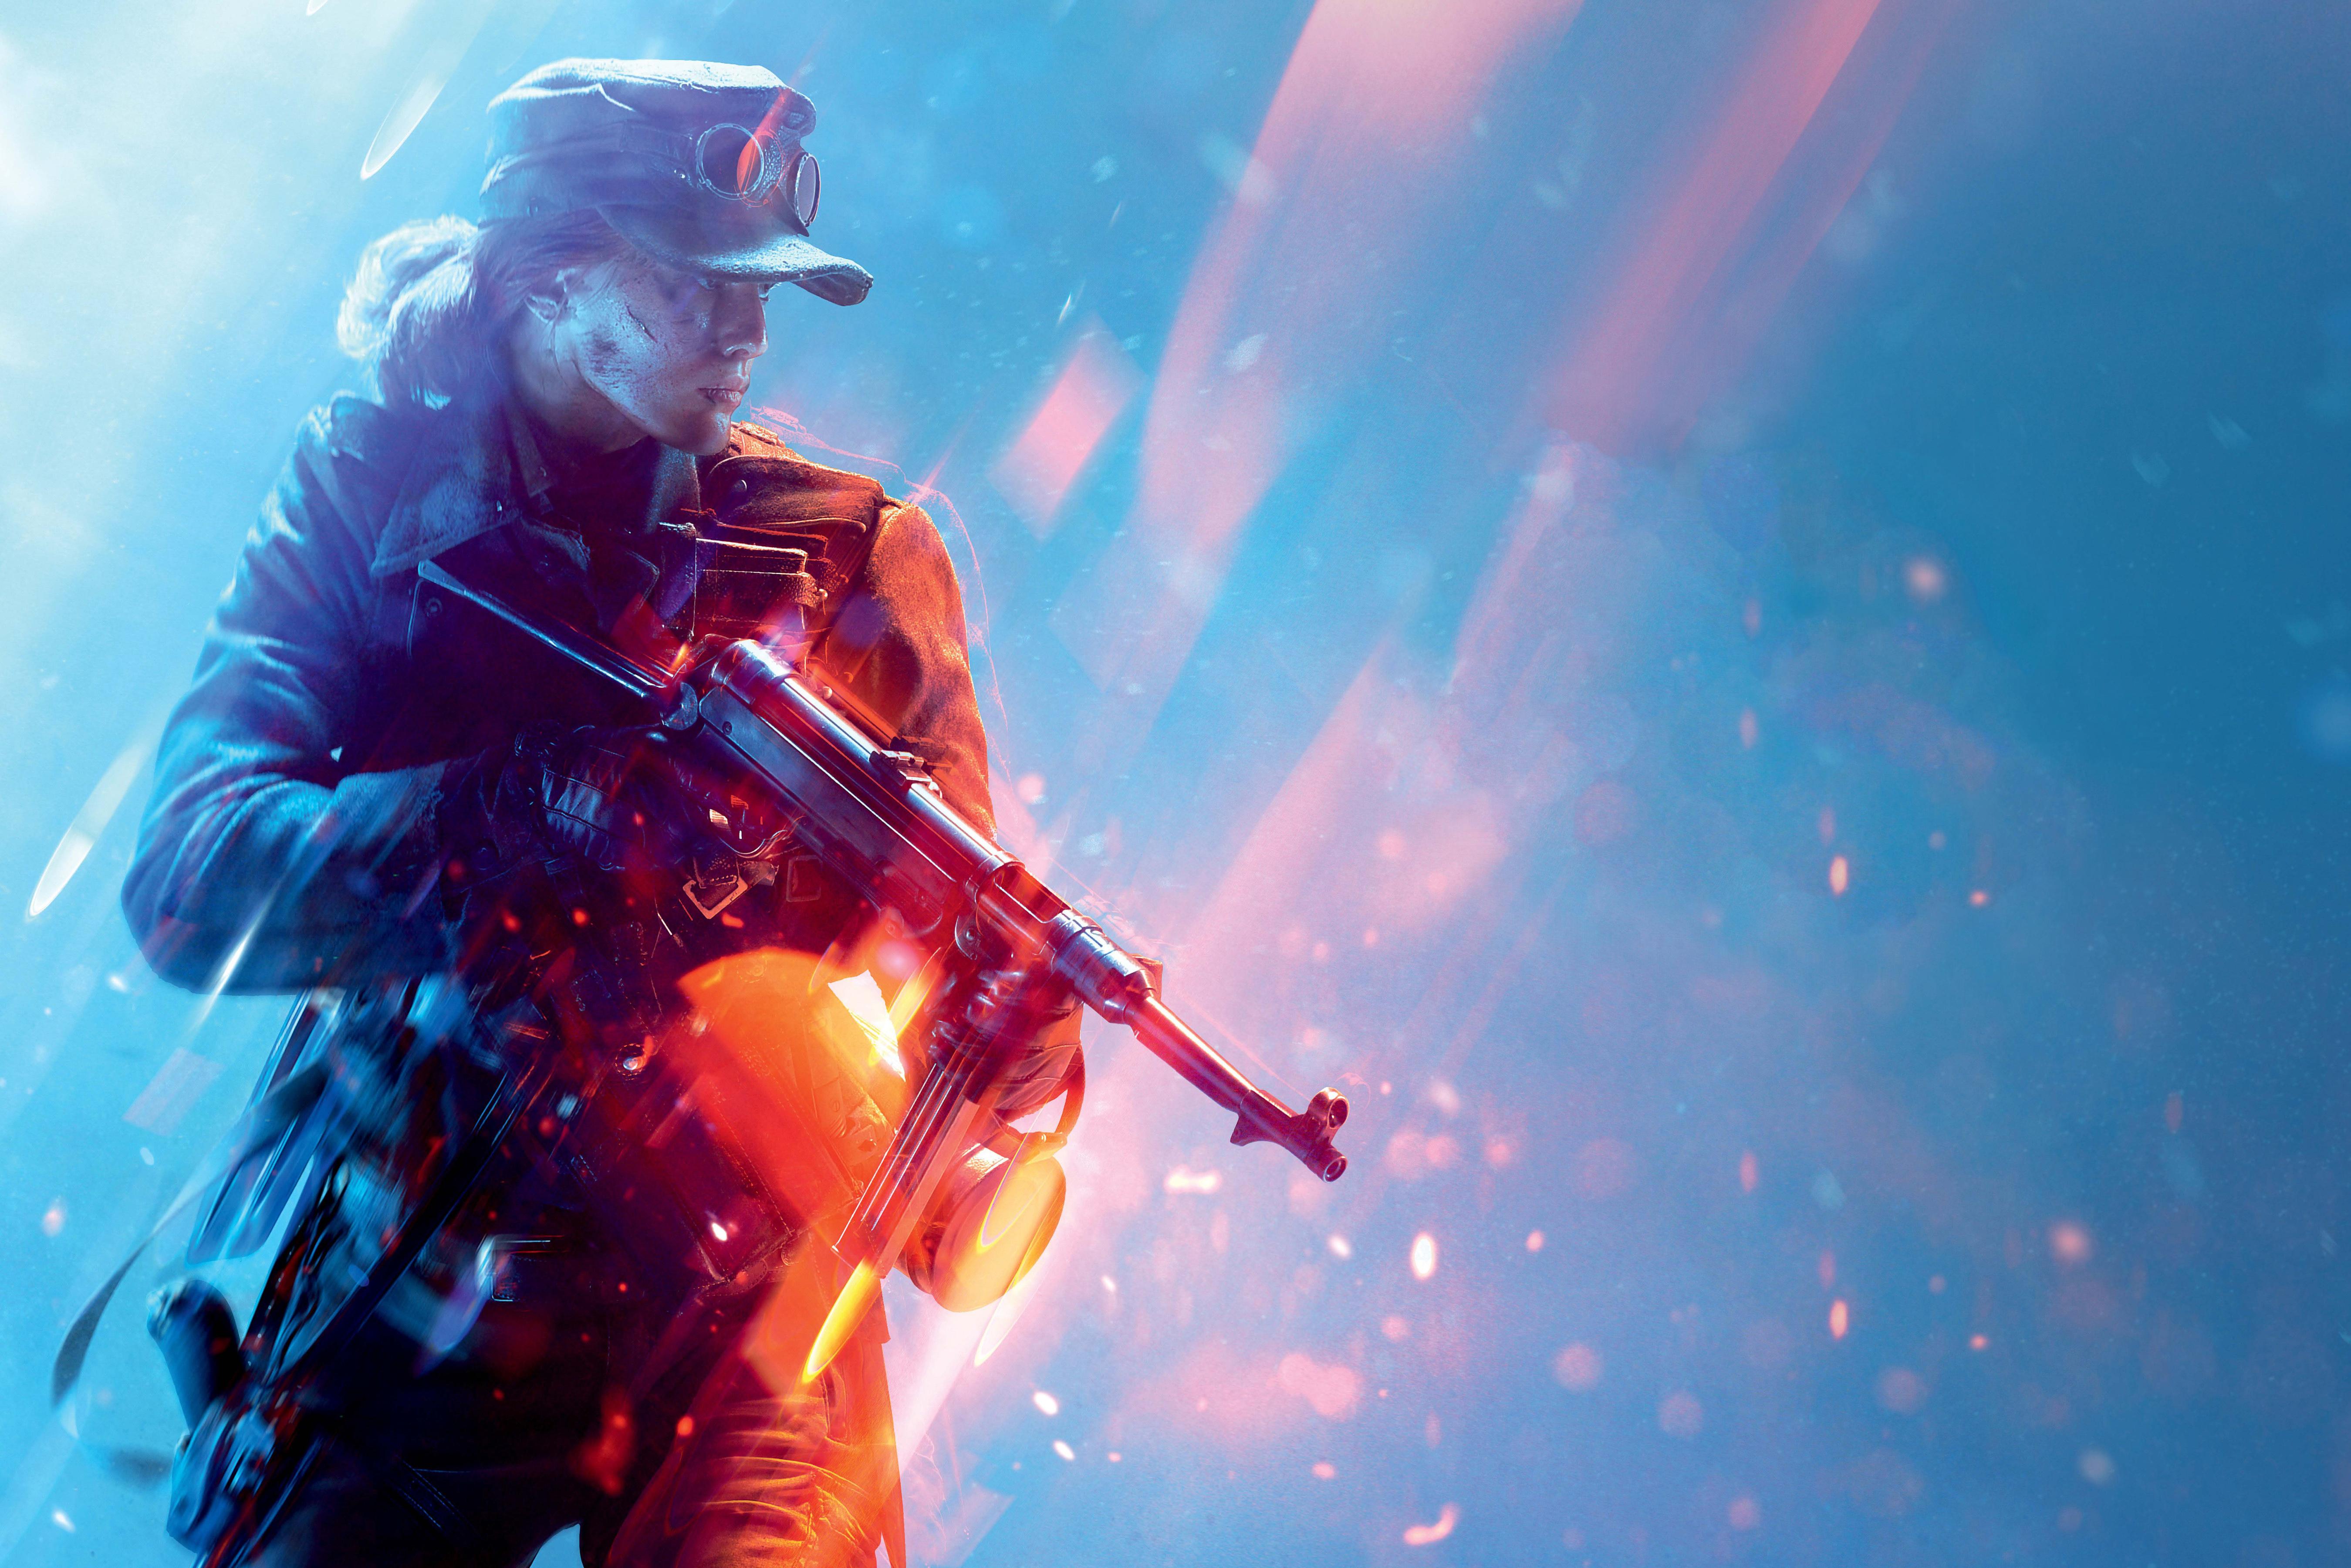 Battlefield V Wallpaper Hd Games 4k Wallpapers Images